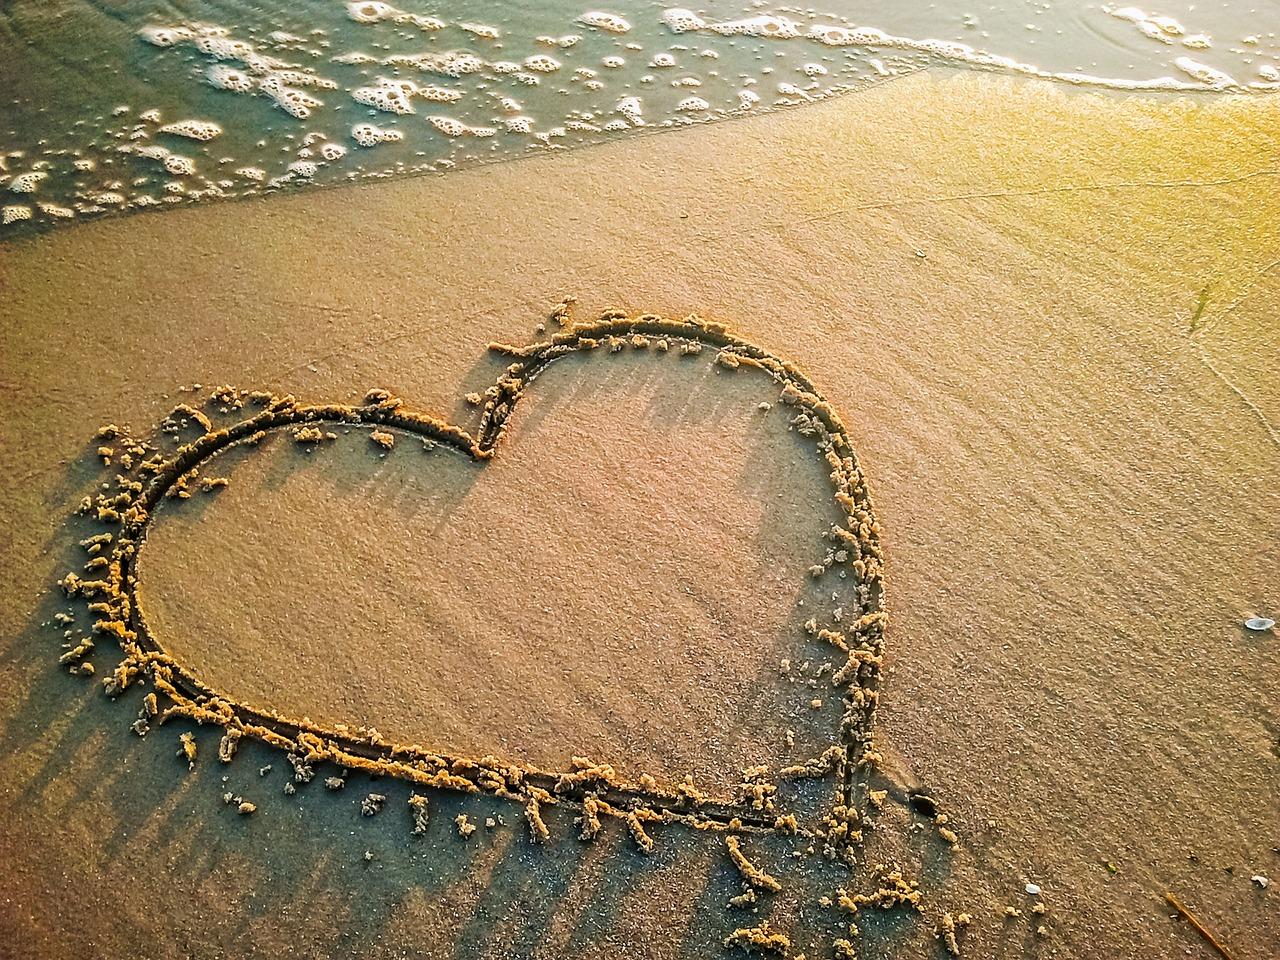 Картинках, картинки сердца на песке